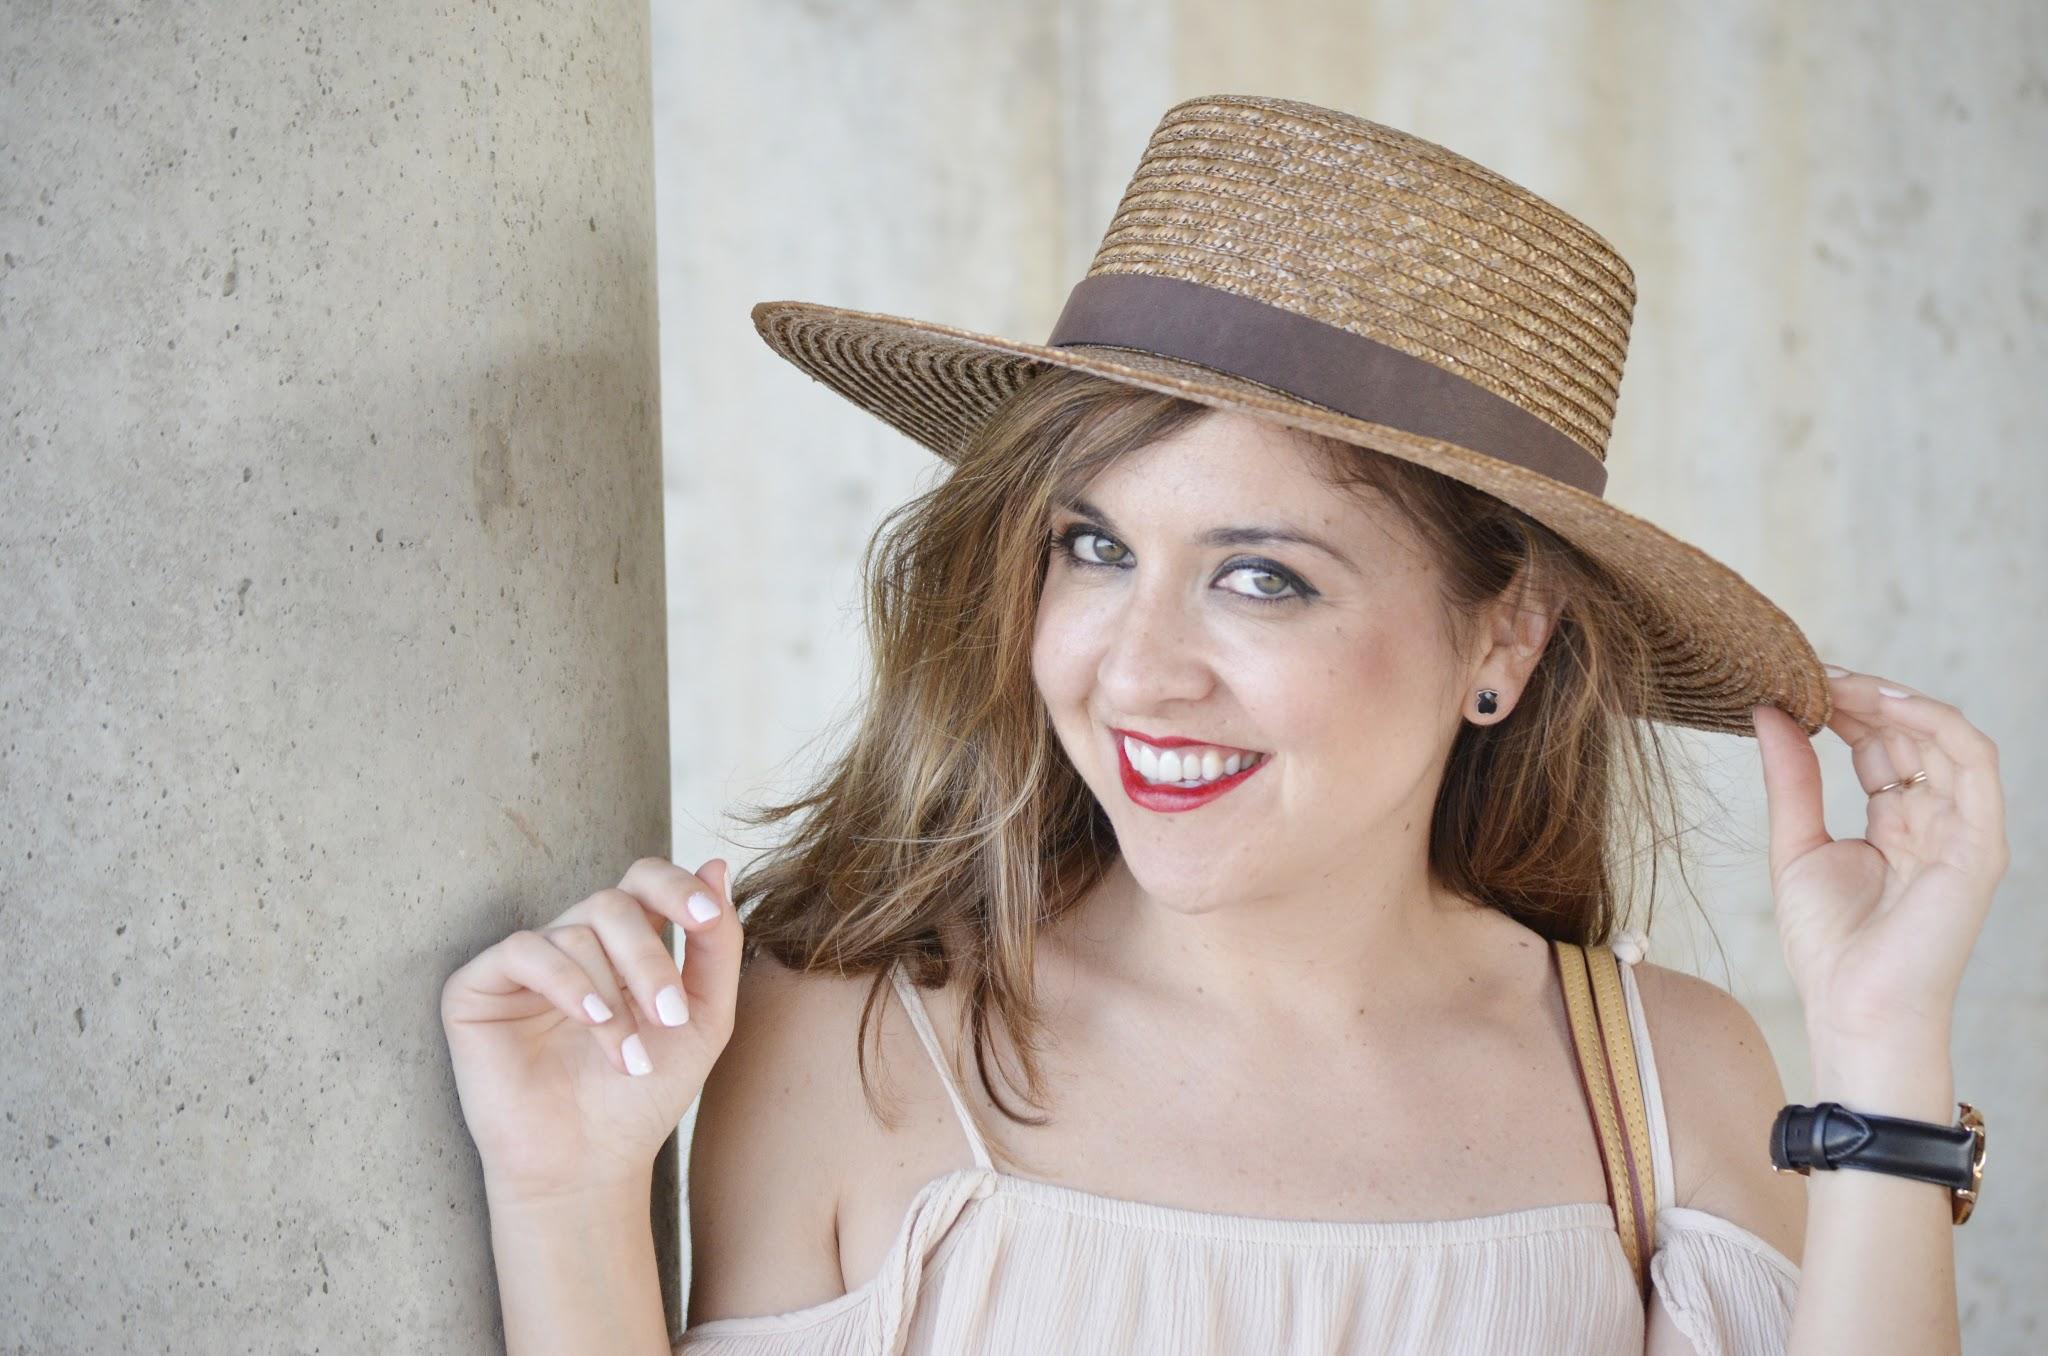 canotier_sombrero_de_moda_tendencia_verano